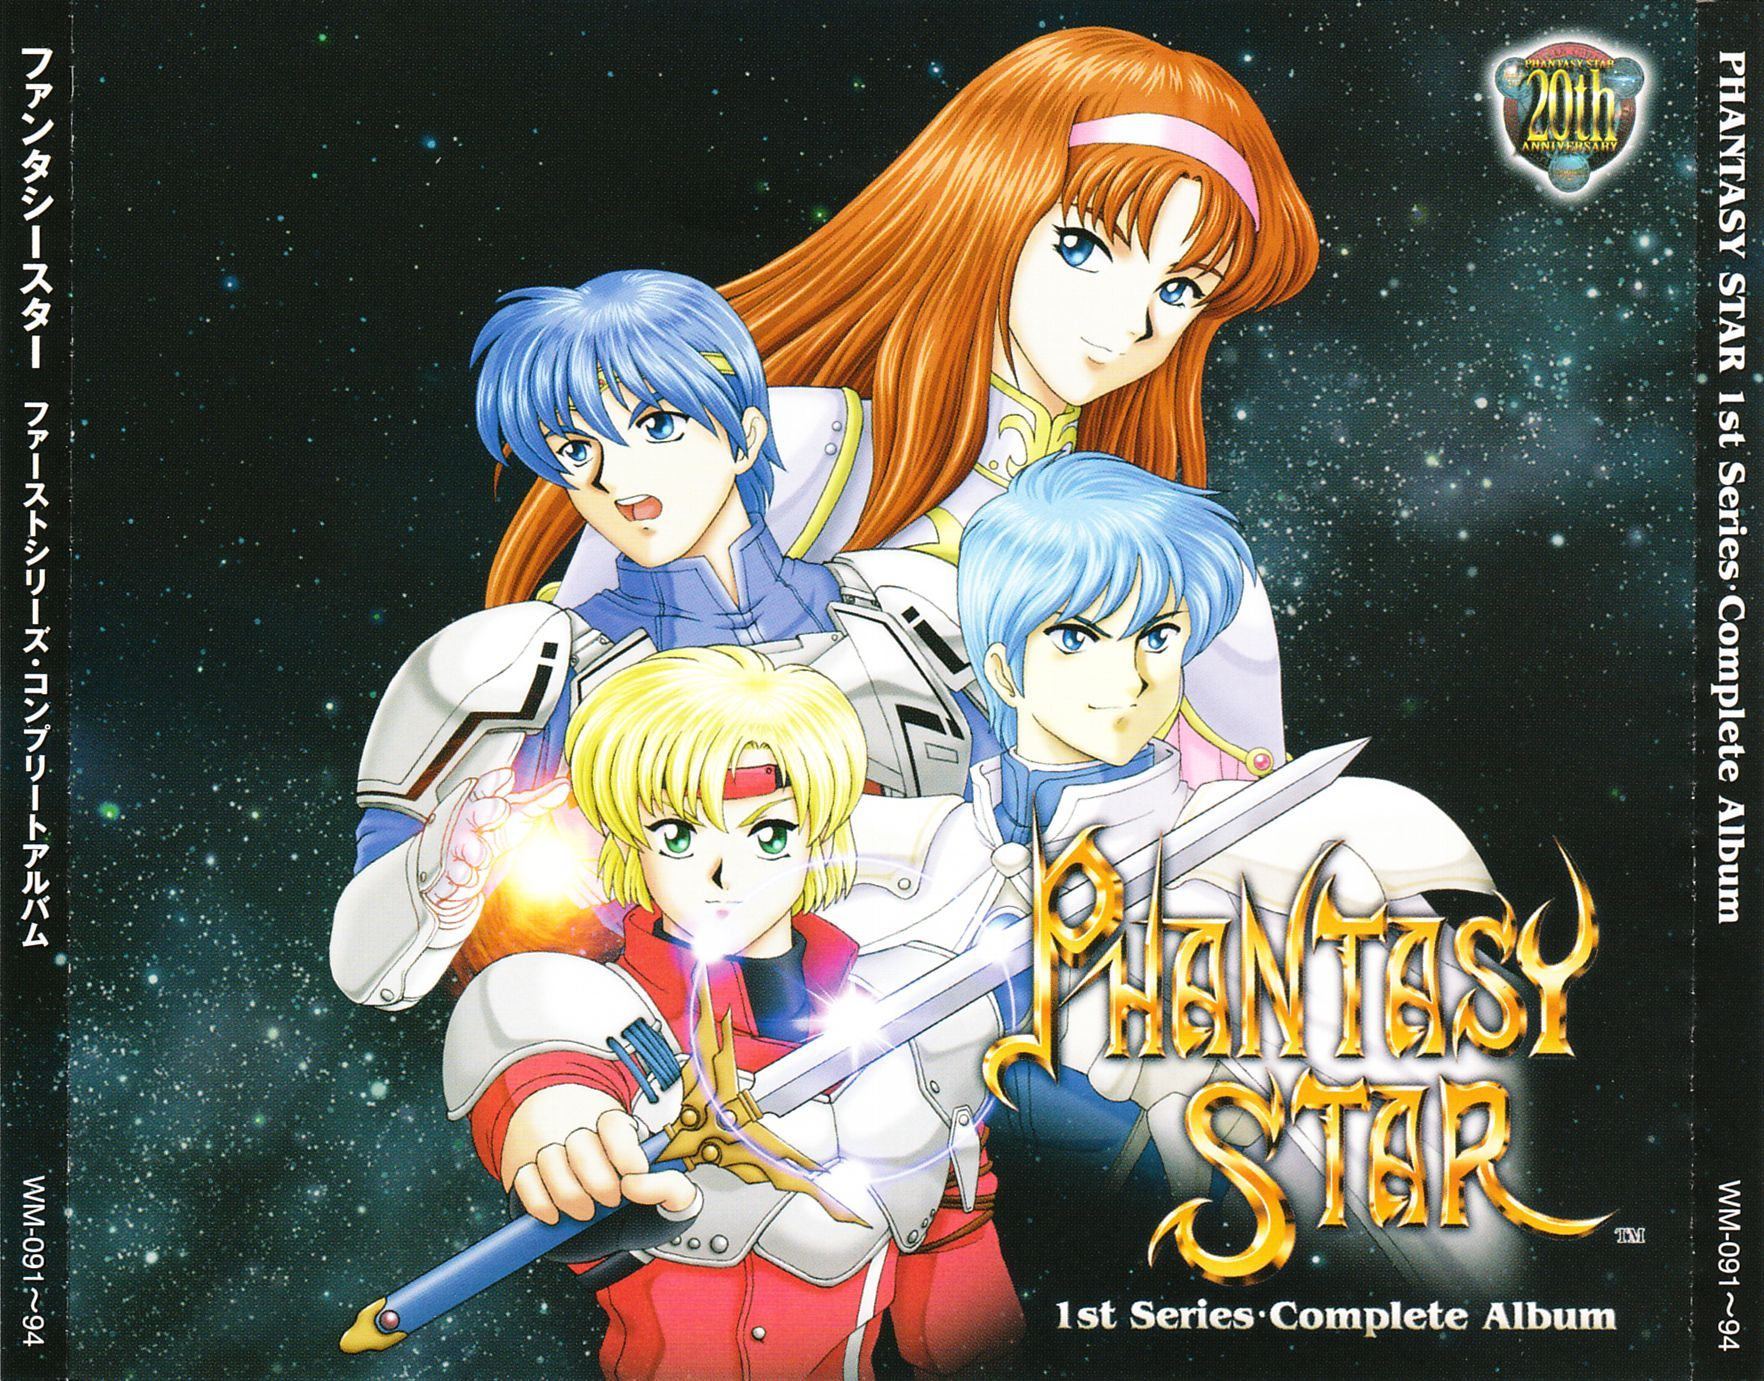 Phantasy Star 1st Series Complete Album Phantasy Star Online Game Character Sega Retro